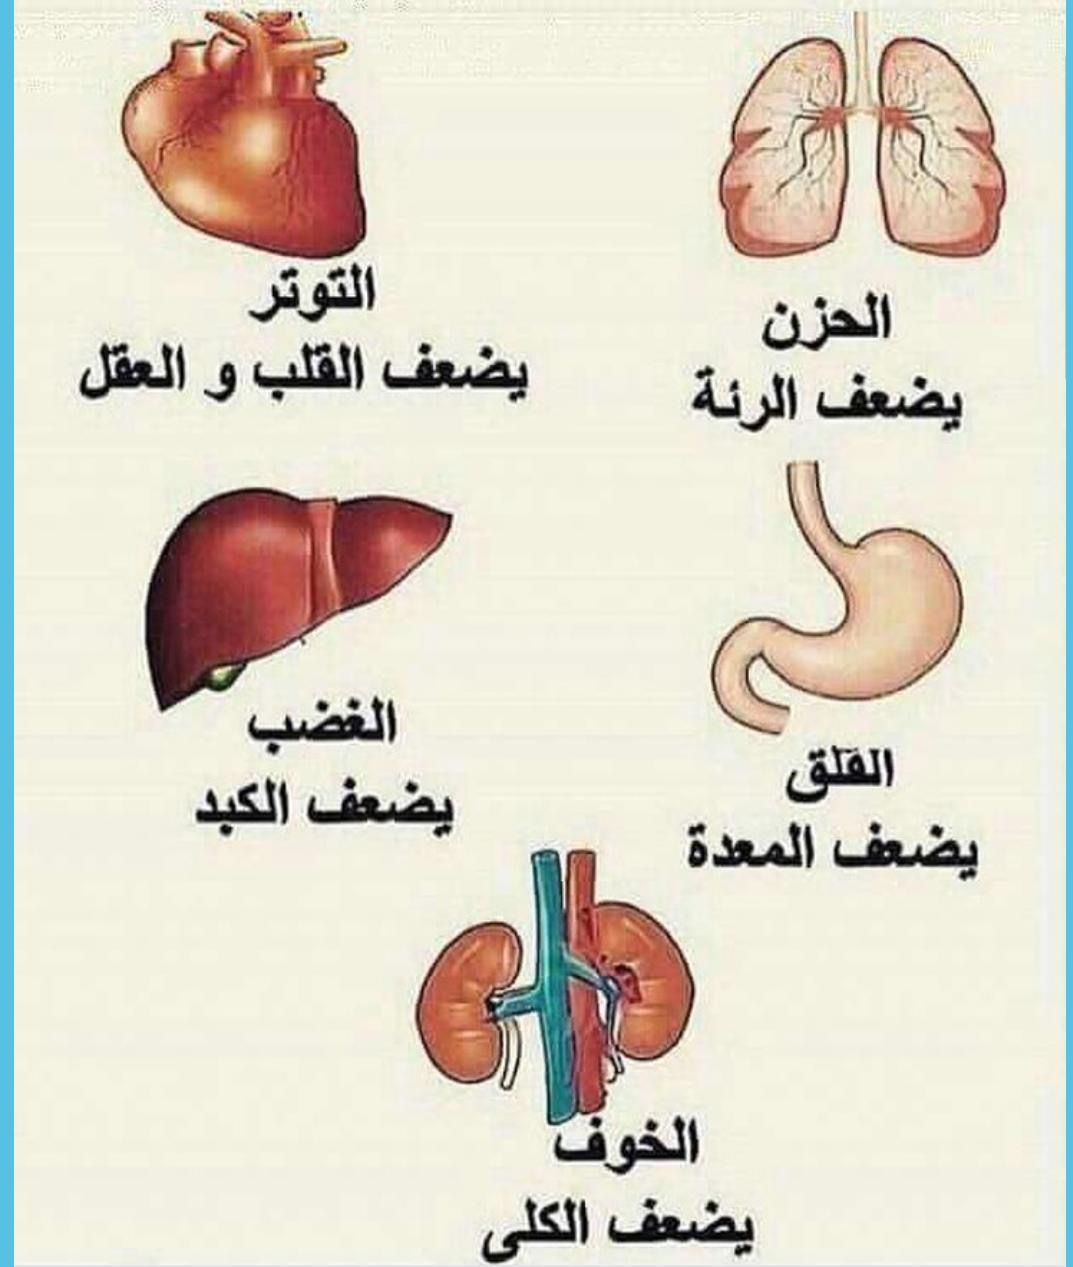 Pin By زهرة علي On معلومات Health Food Health